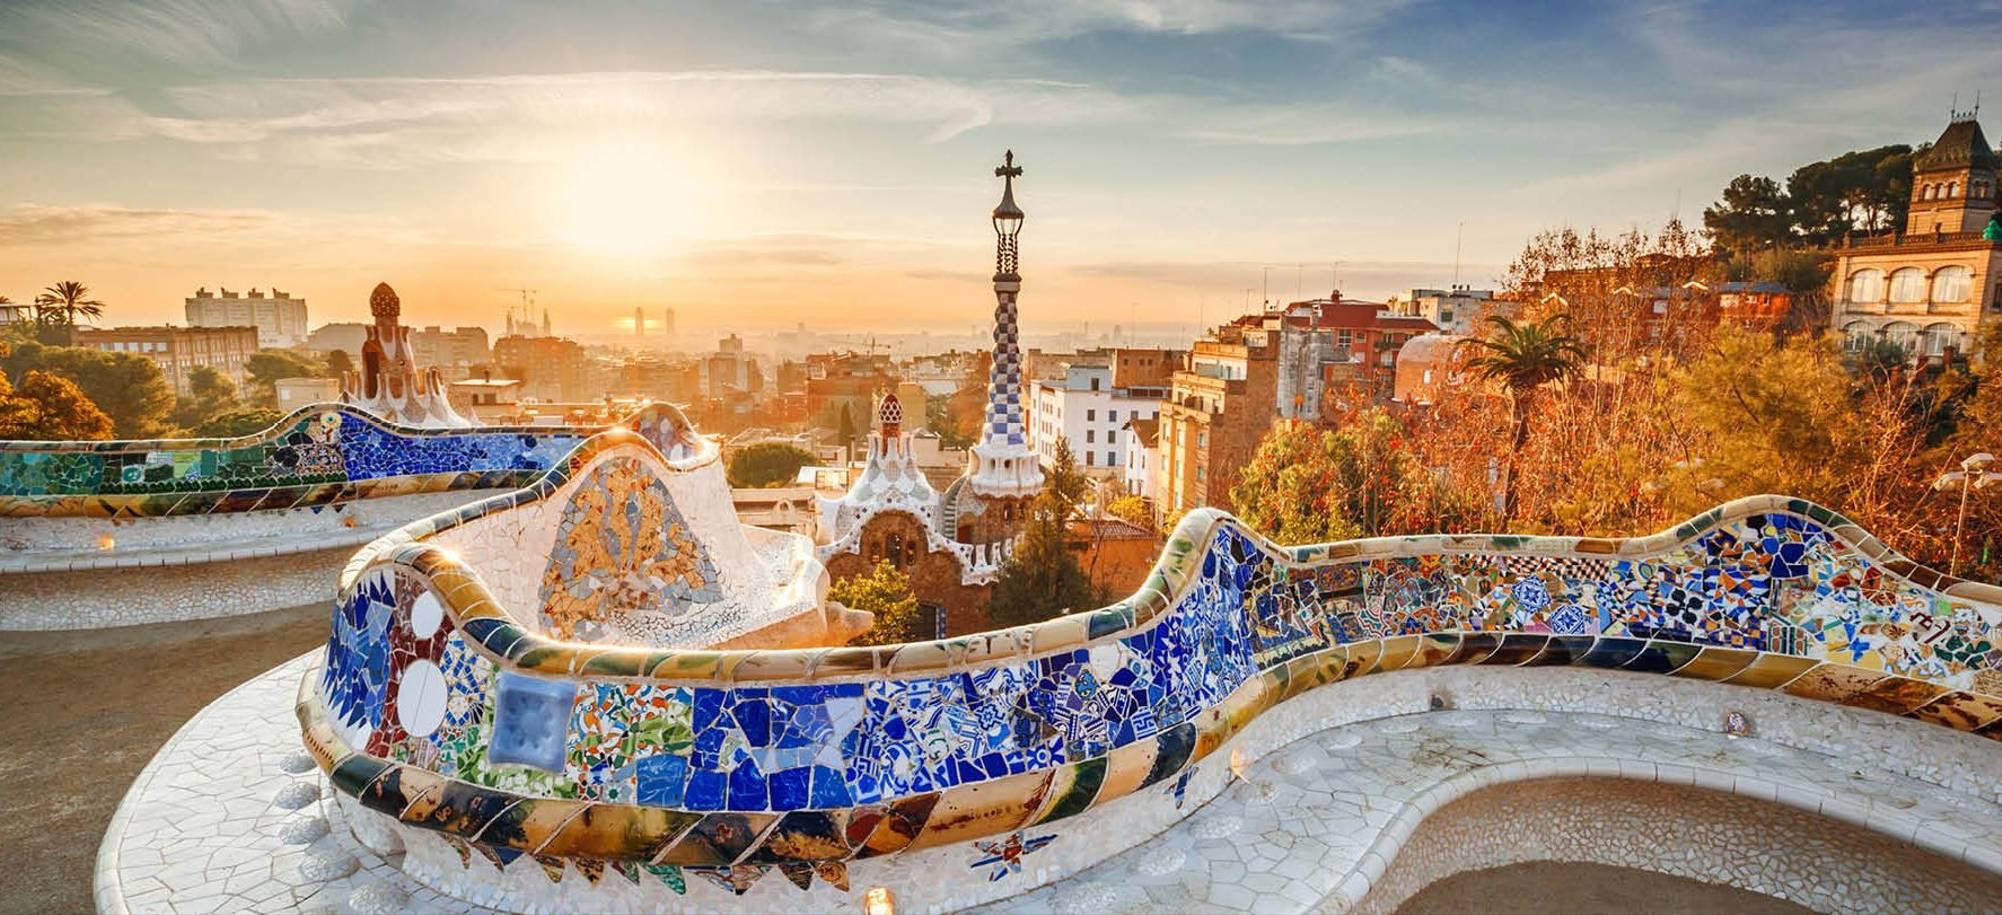 6 - Barcelona.jpg